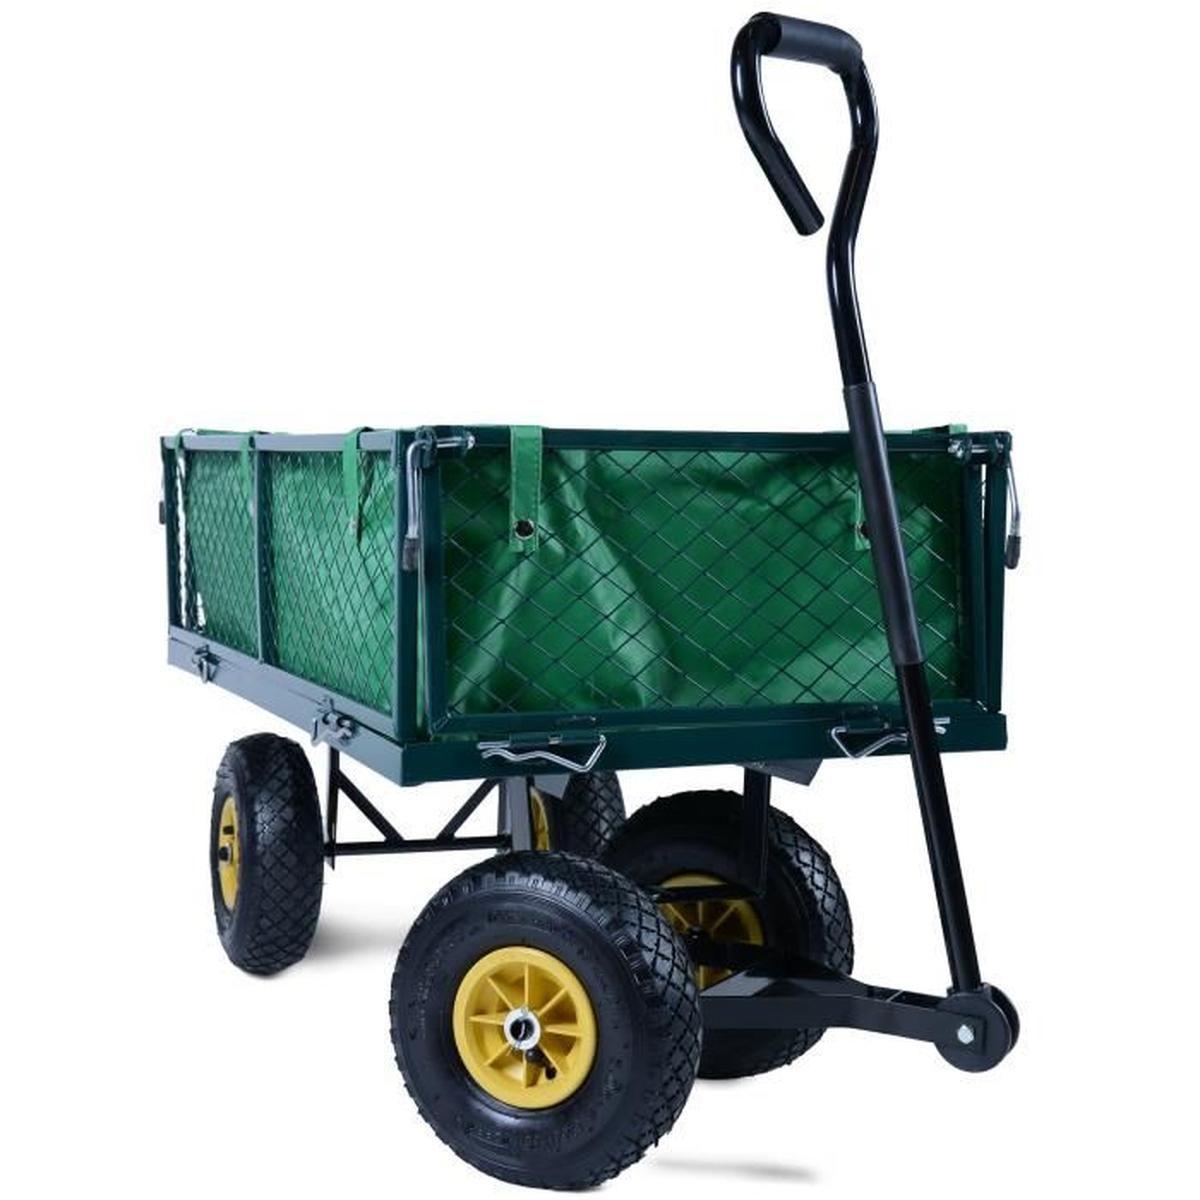 Chariot De Transport Jardin Charette Chariot Remorque À Main 4 Pneus Vert concernant Chariot De Jardin Multi Usage